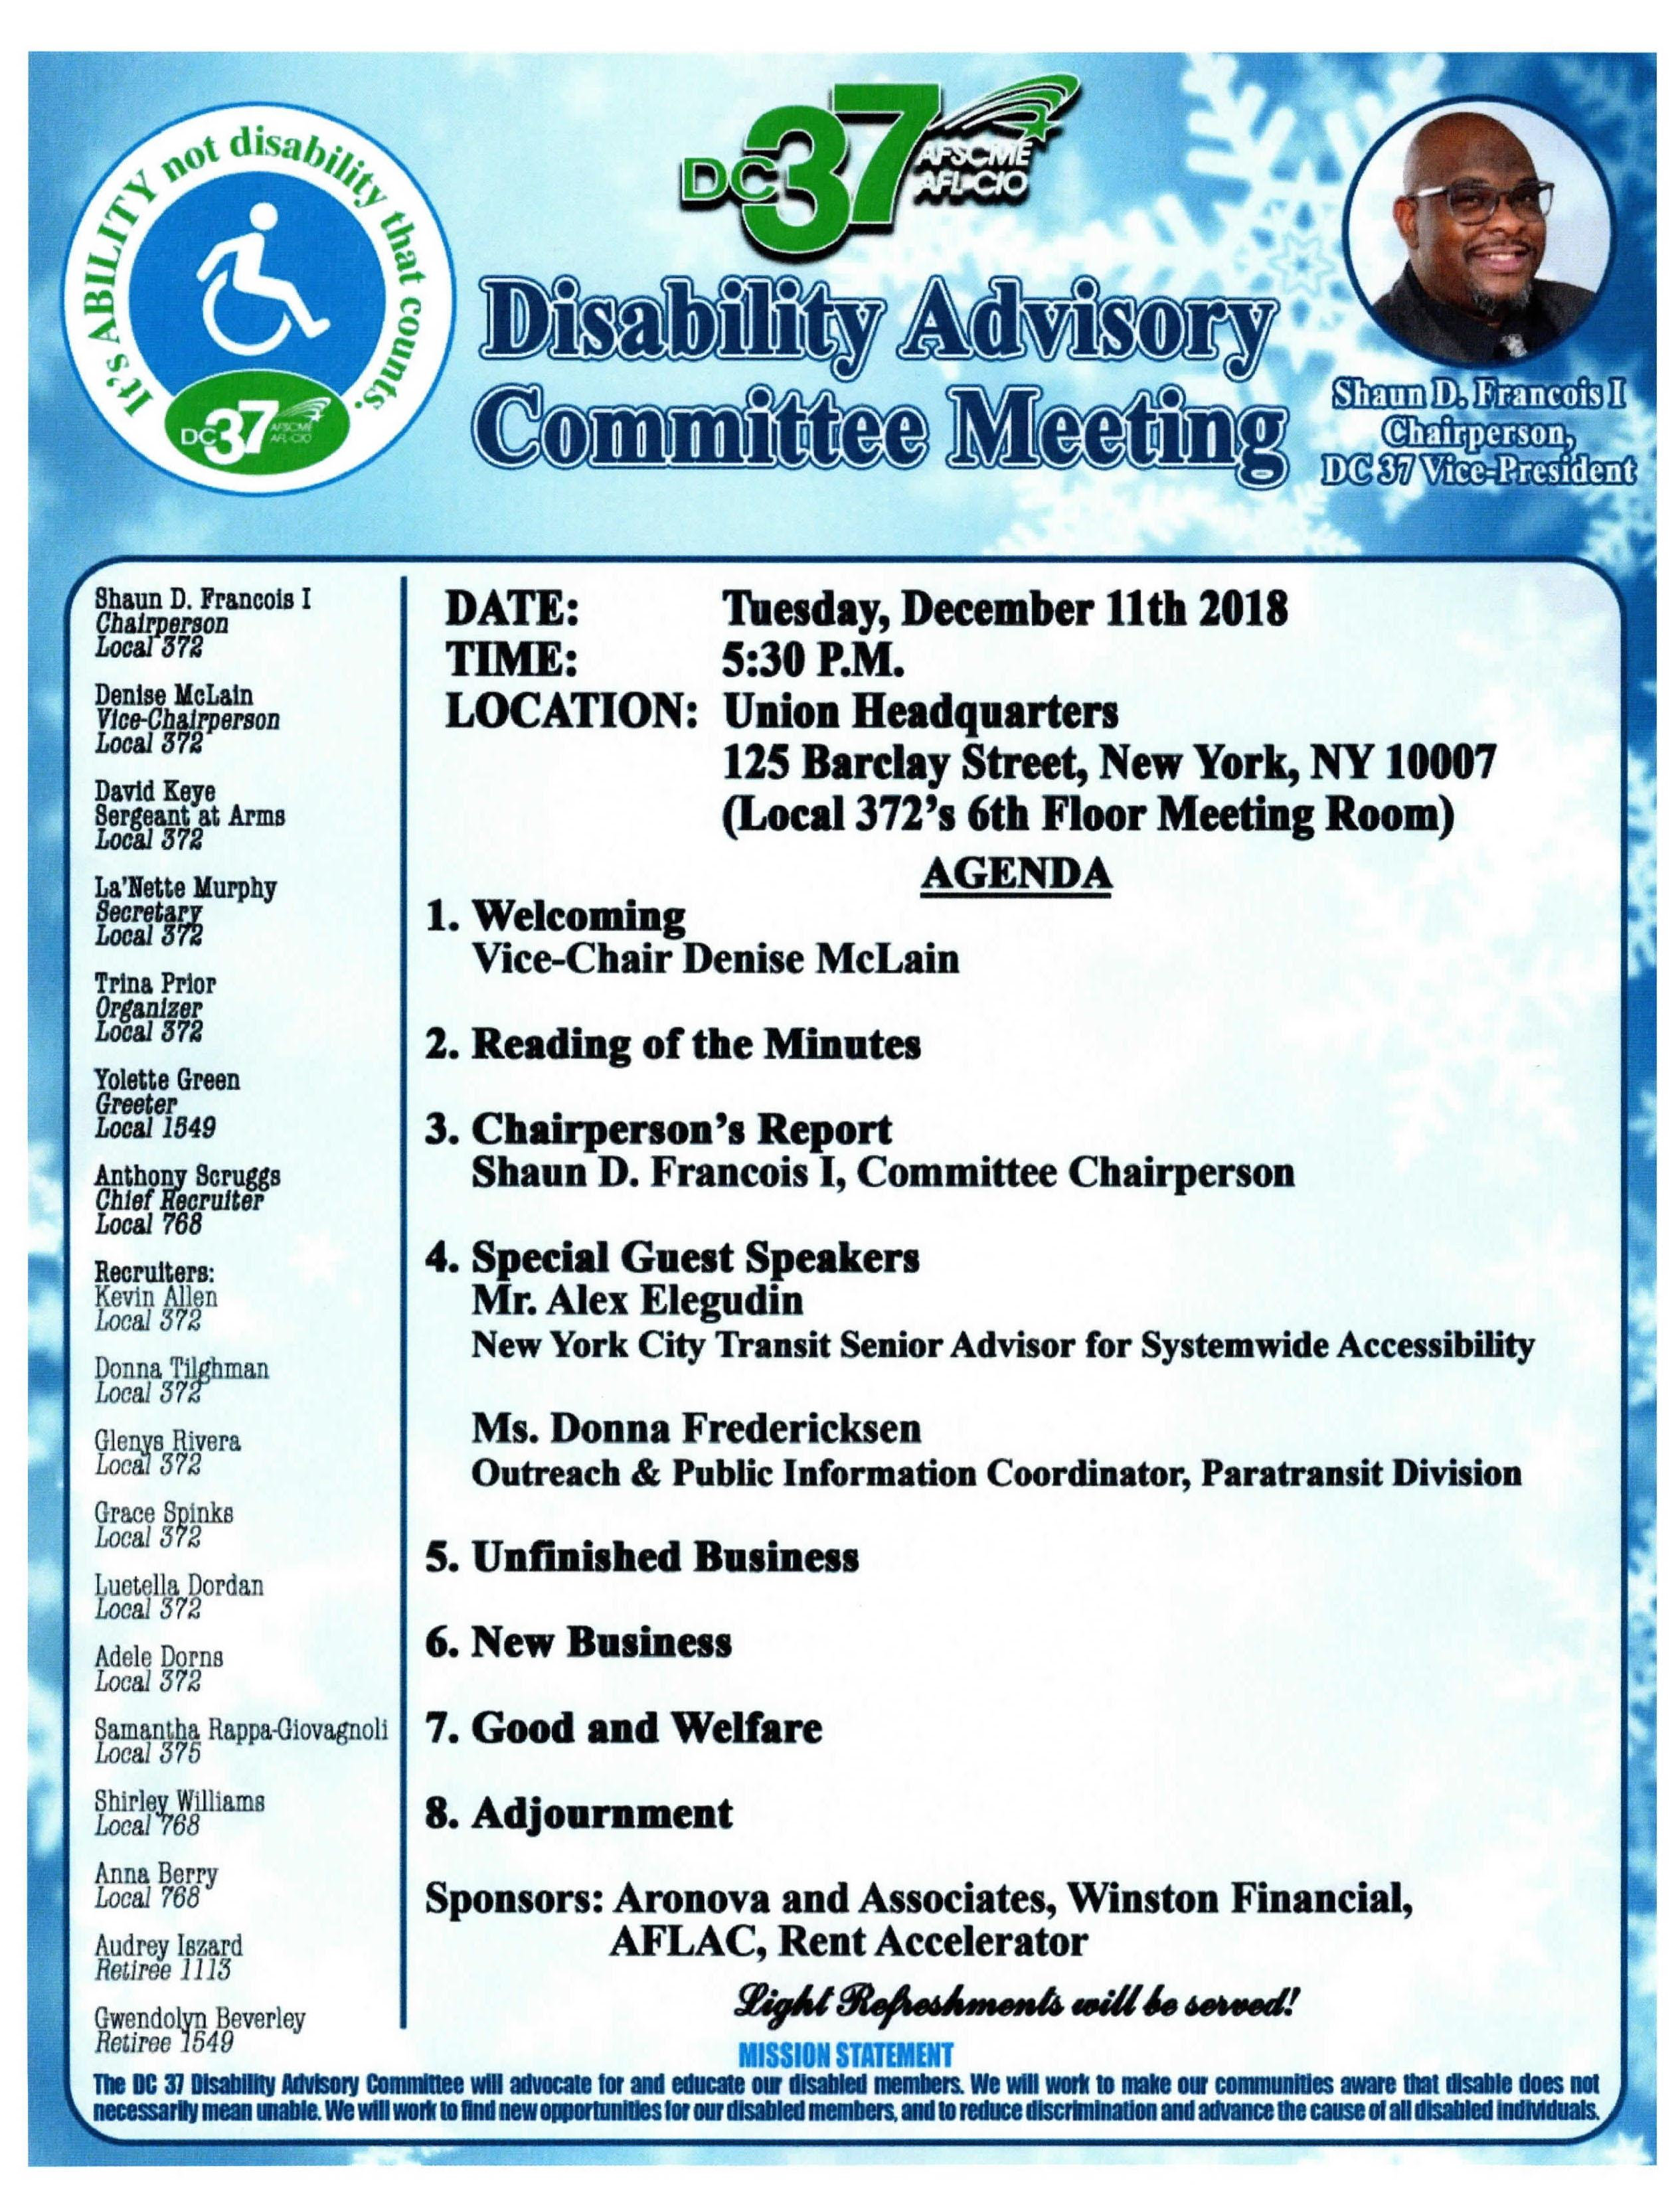 dc_37_disability_cmtejpg 88464 kb